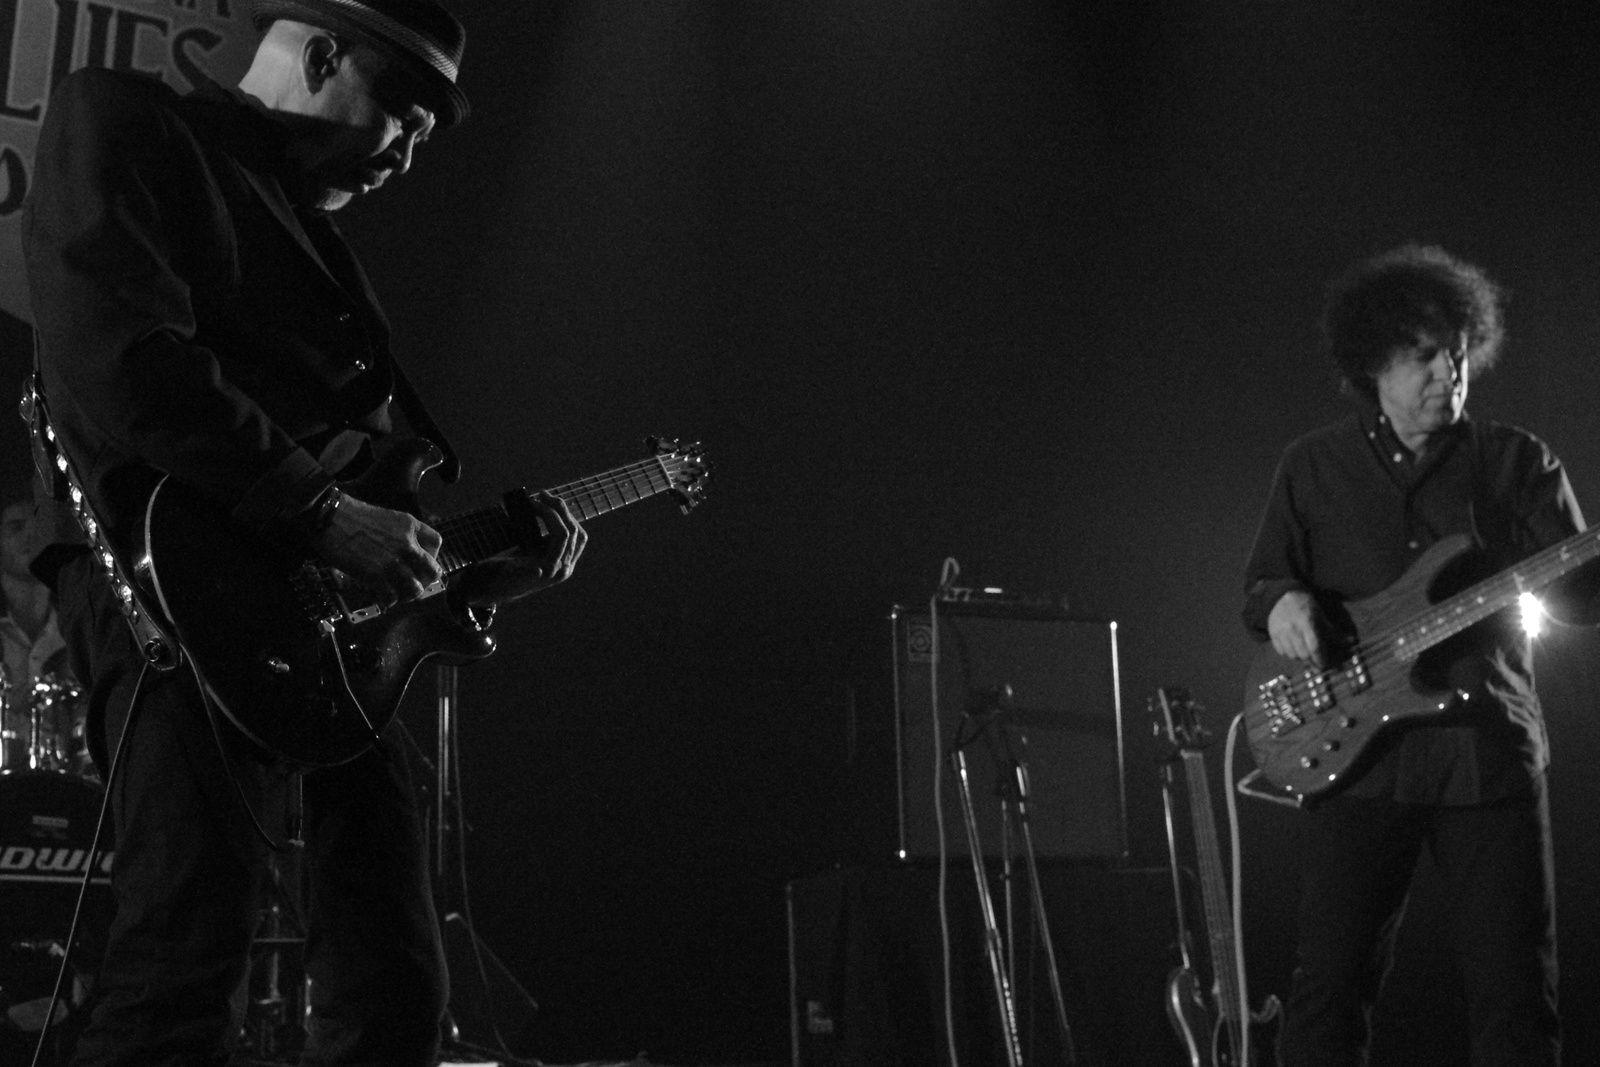 Van Wilks Band - 25/11/2017 - Athena Blues Festival, St Saulve (59)